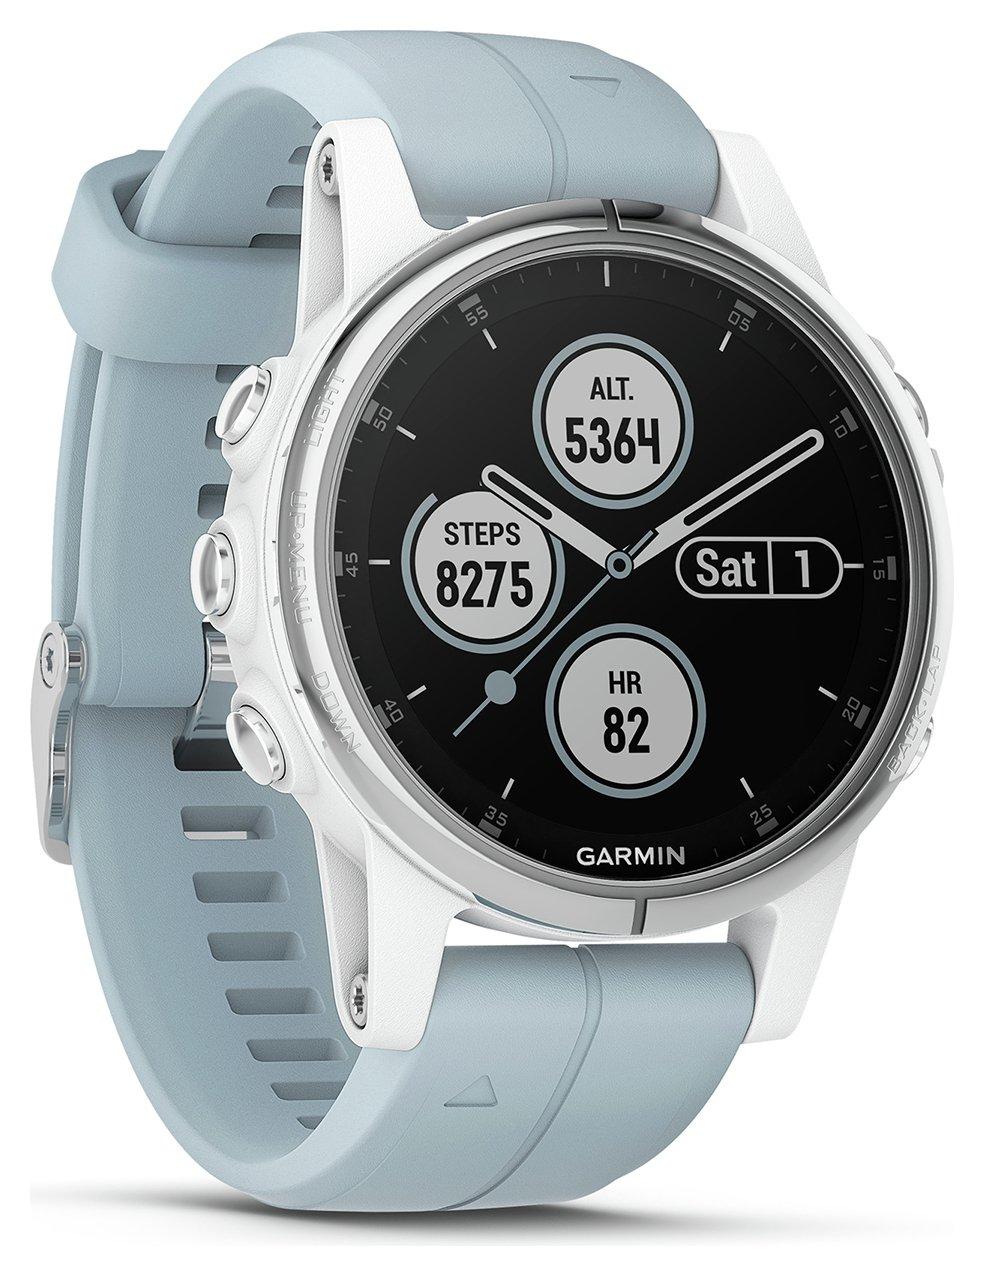 Garmin Fenix 5S Plus GPS Smart Watch - White & Teal